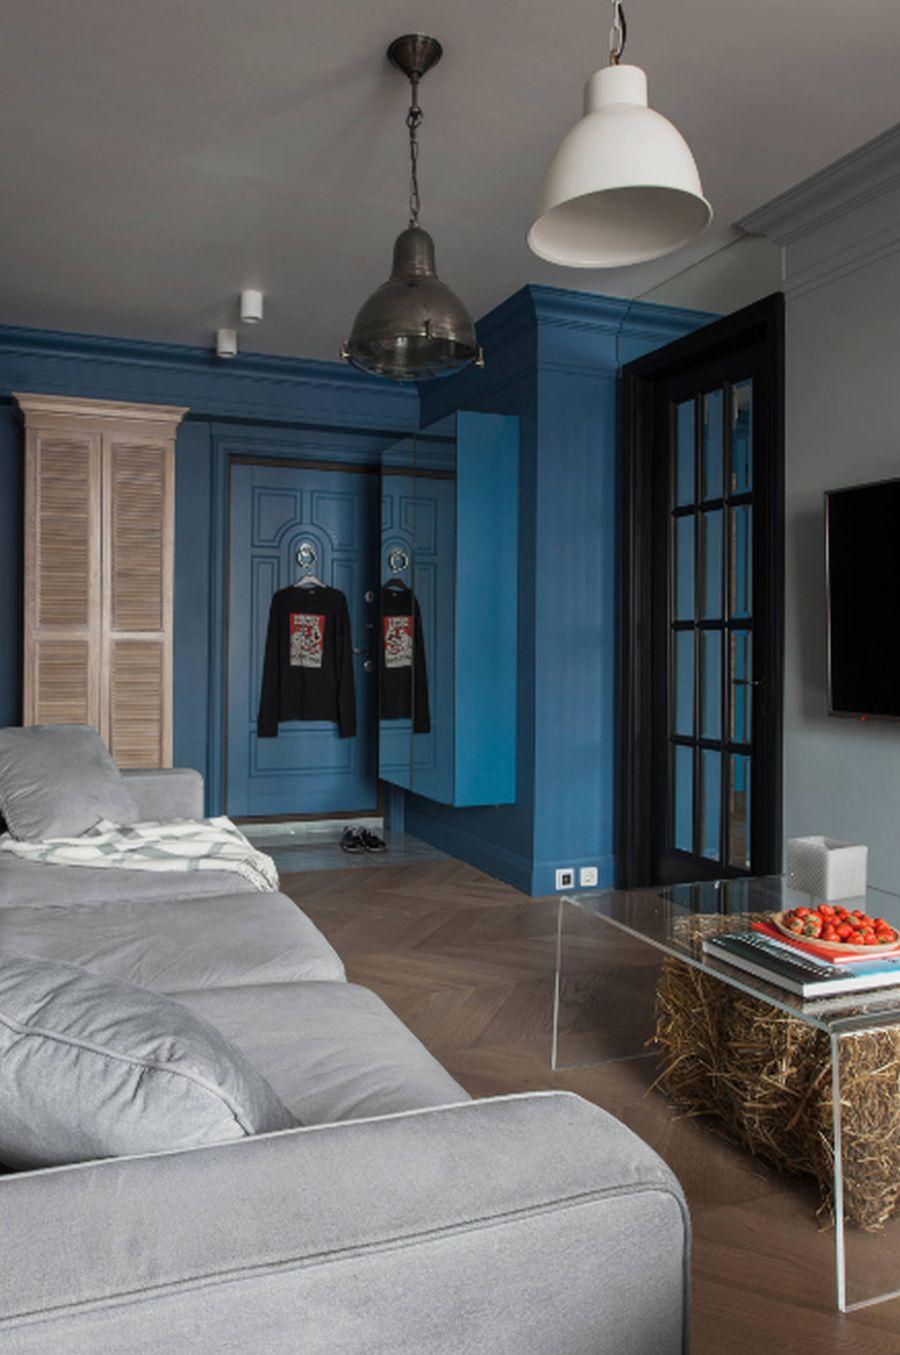 adelaparvu-com-despre-reoganizarea-unui-apartament-de-2-camere-in-3-camere-54-mp-designer-masha-kunyakina-foto-olga-melekesceva-8